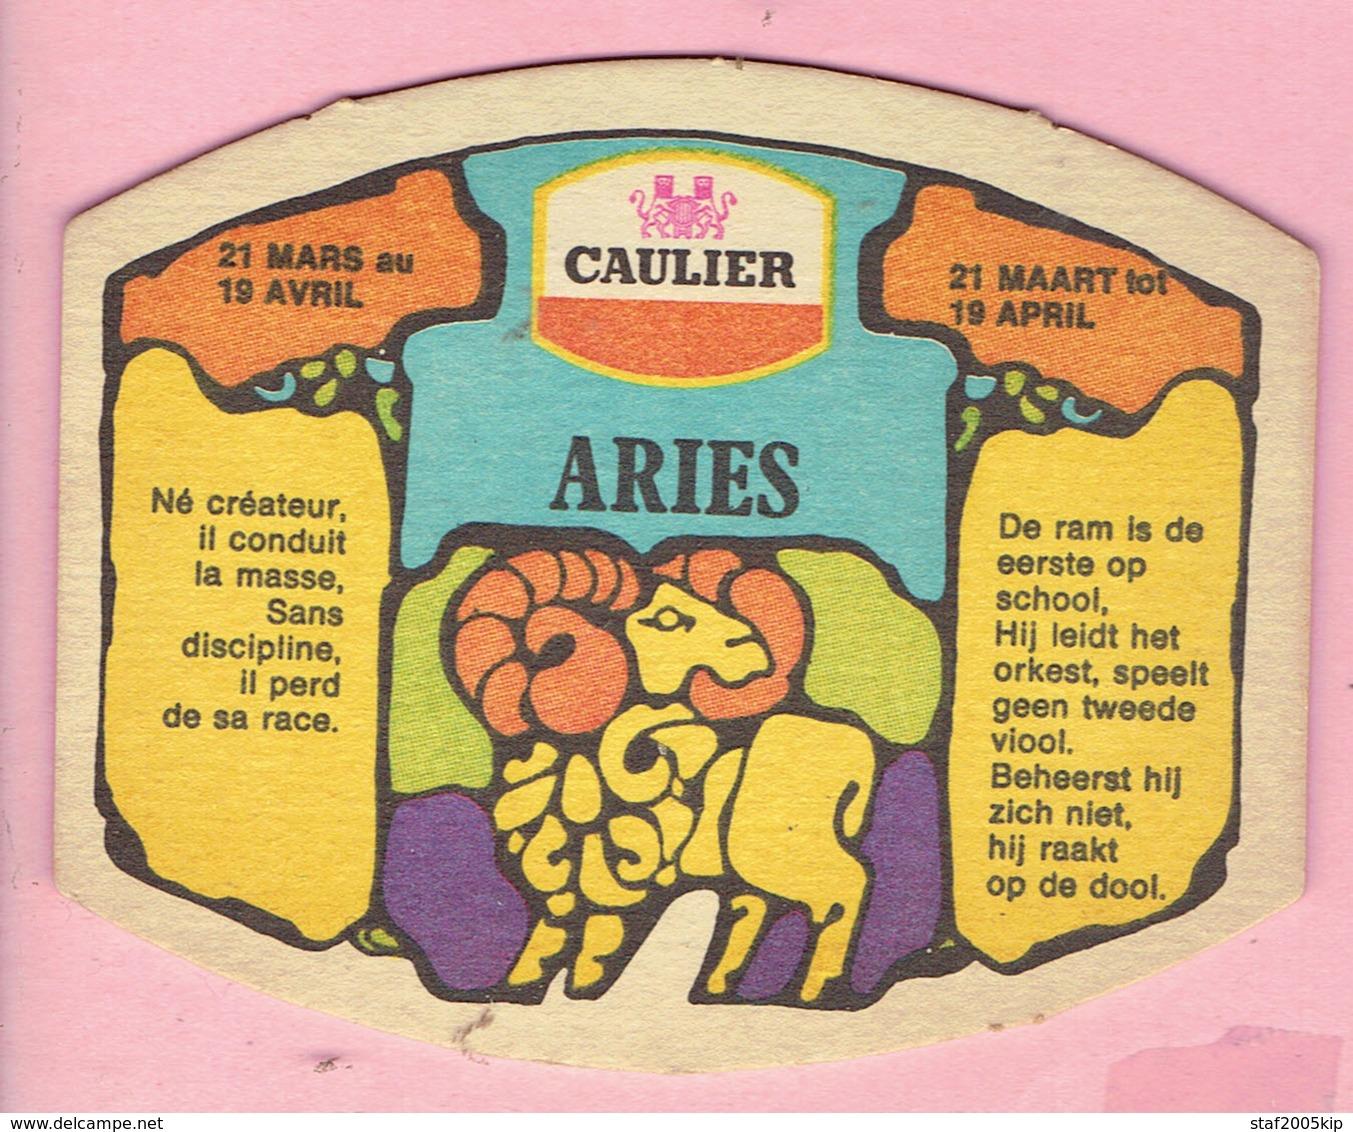 Bierviltjes - CAULIER - Horoscoop - ARIES - RAM - Sous-bocks